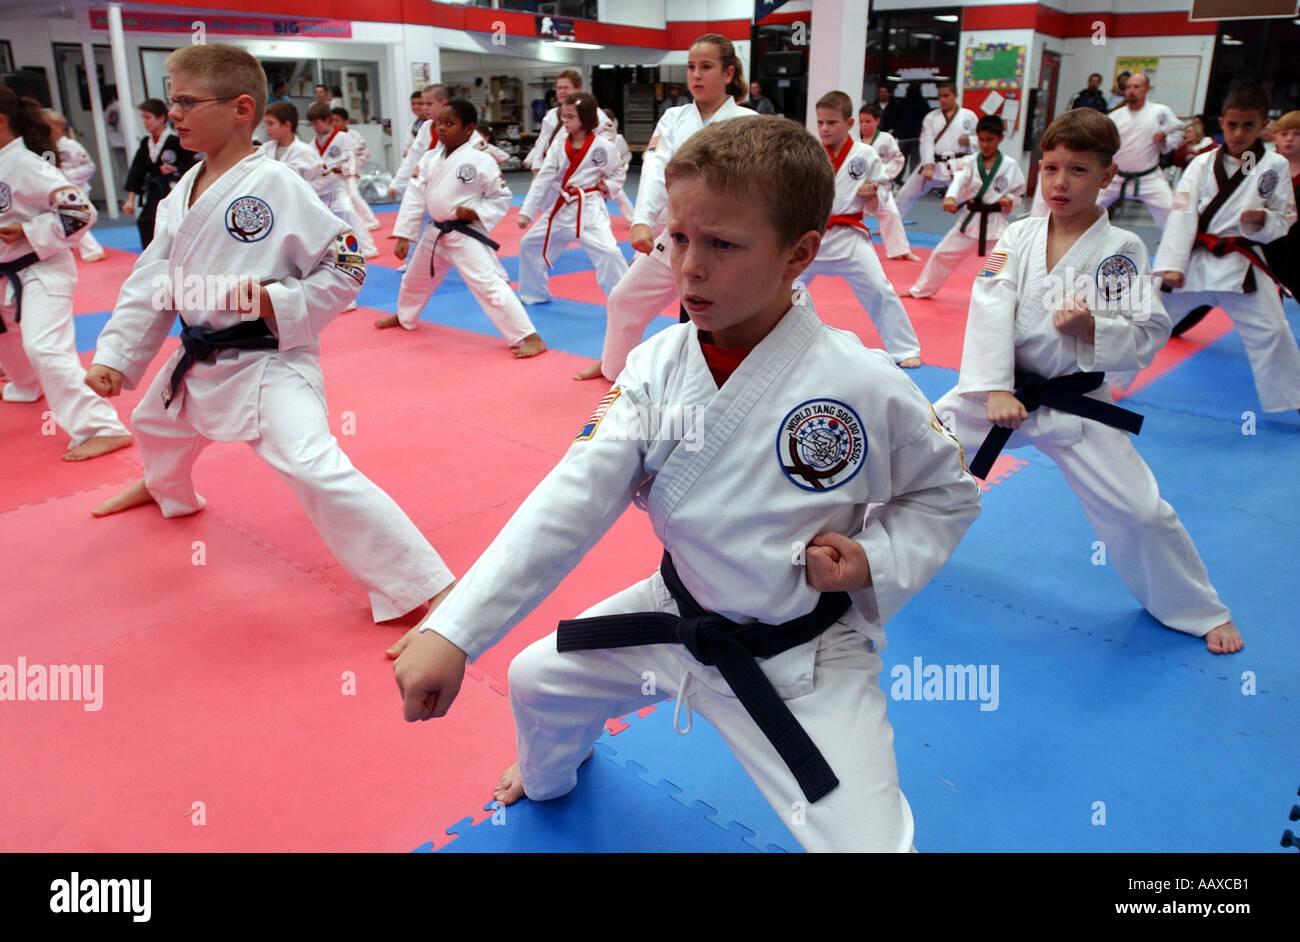 Kids Karate Tournament Orlando